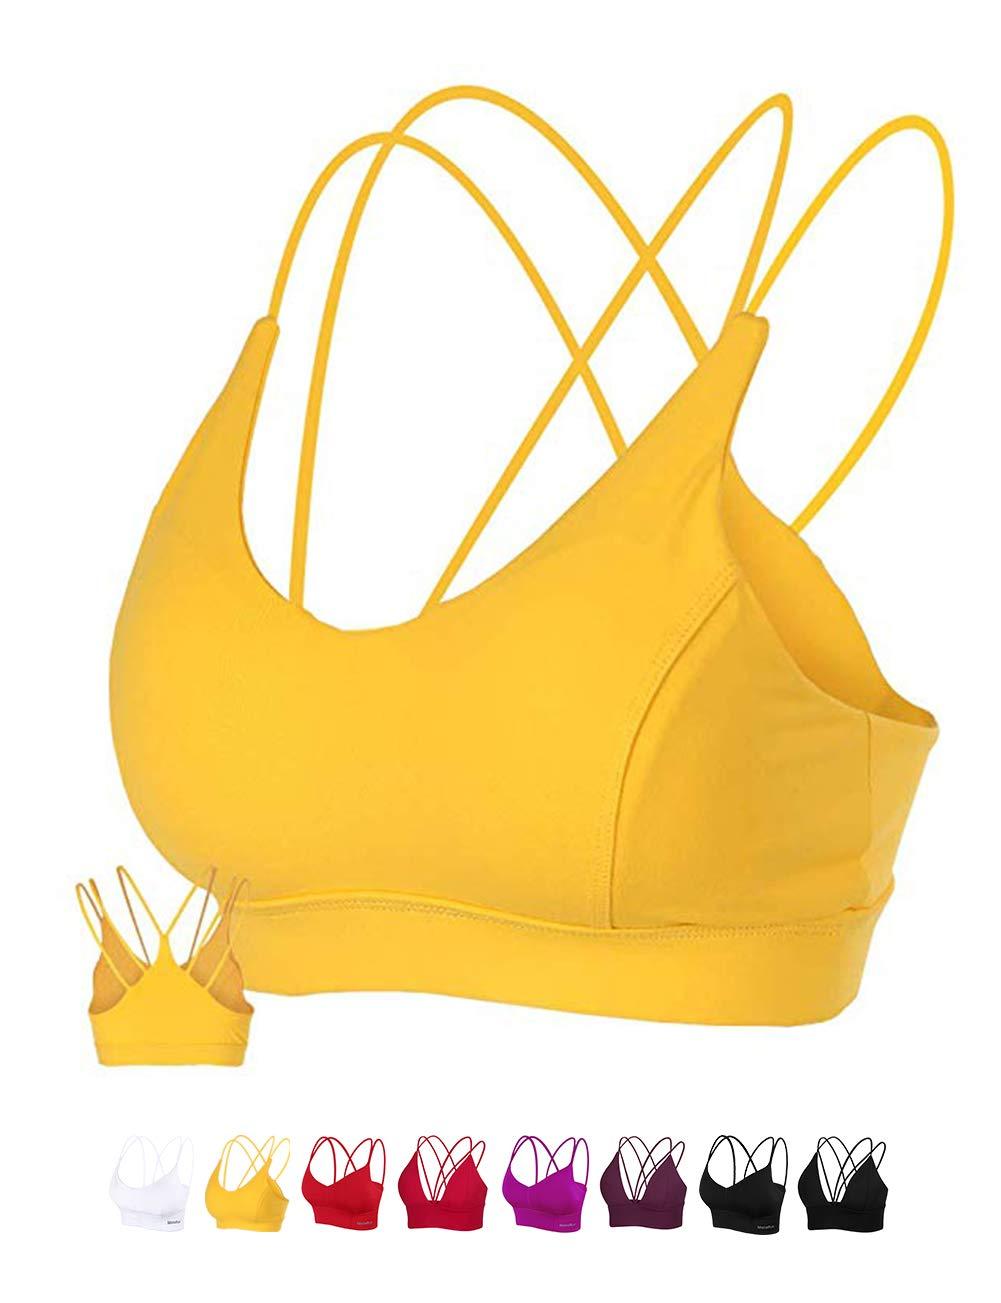 MotoRun Womens Push-Up Padded Strappy Sports Bra Cross Back Wirefree Fitness Yoga Top Lemon Yellow